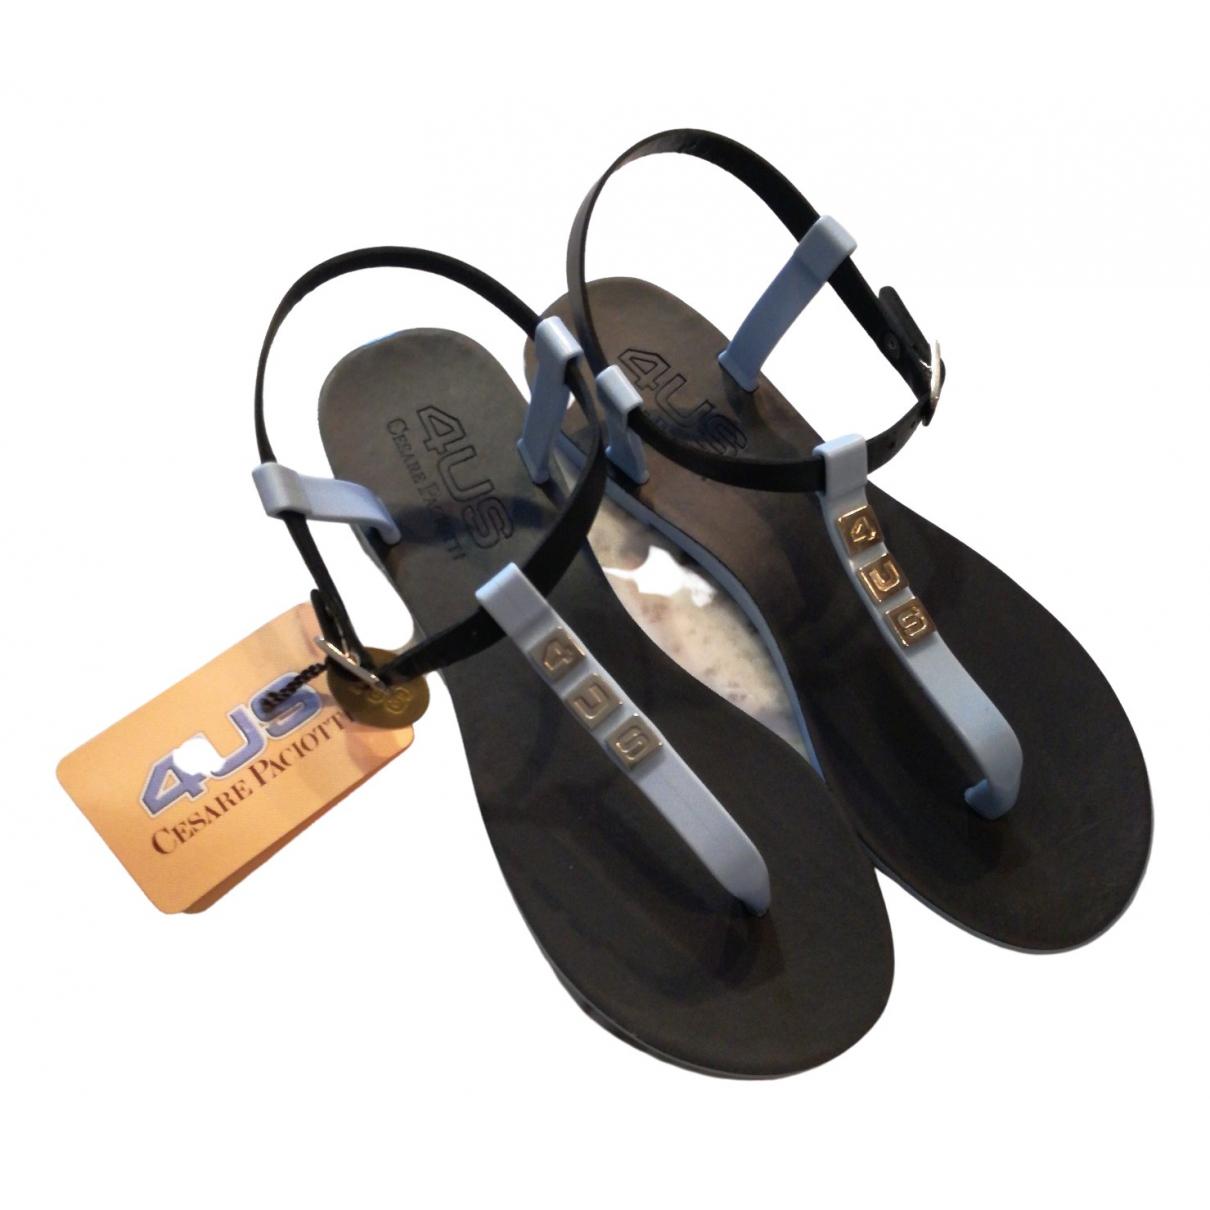 Cesare Paciotti \N Sandals for Women 38 EU